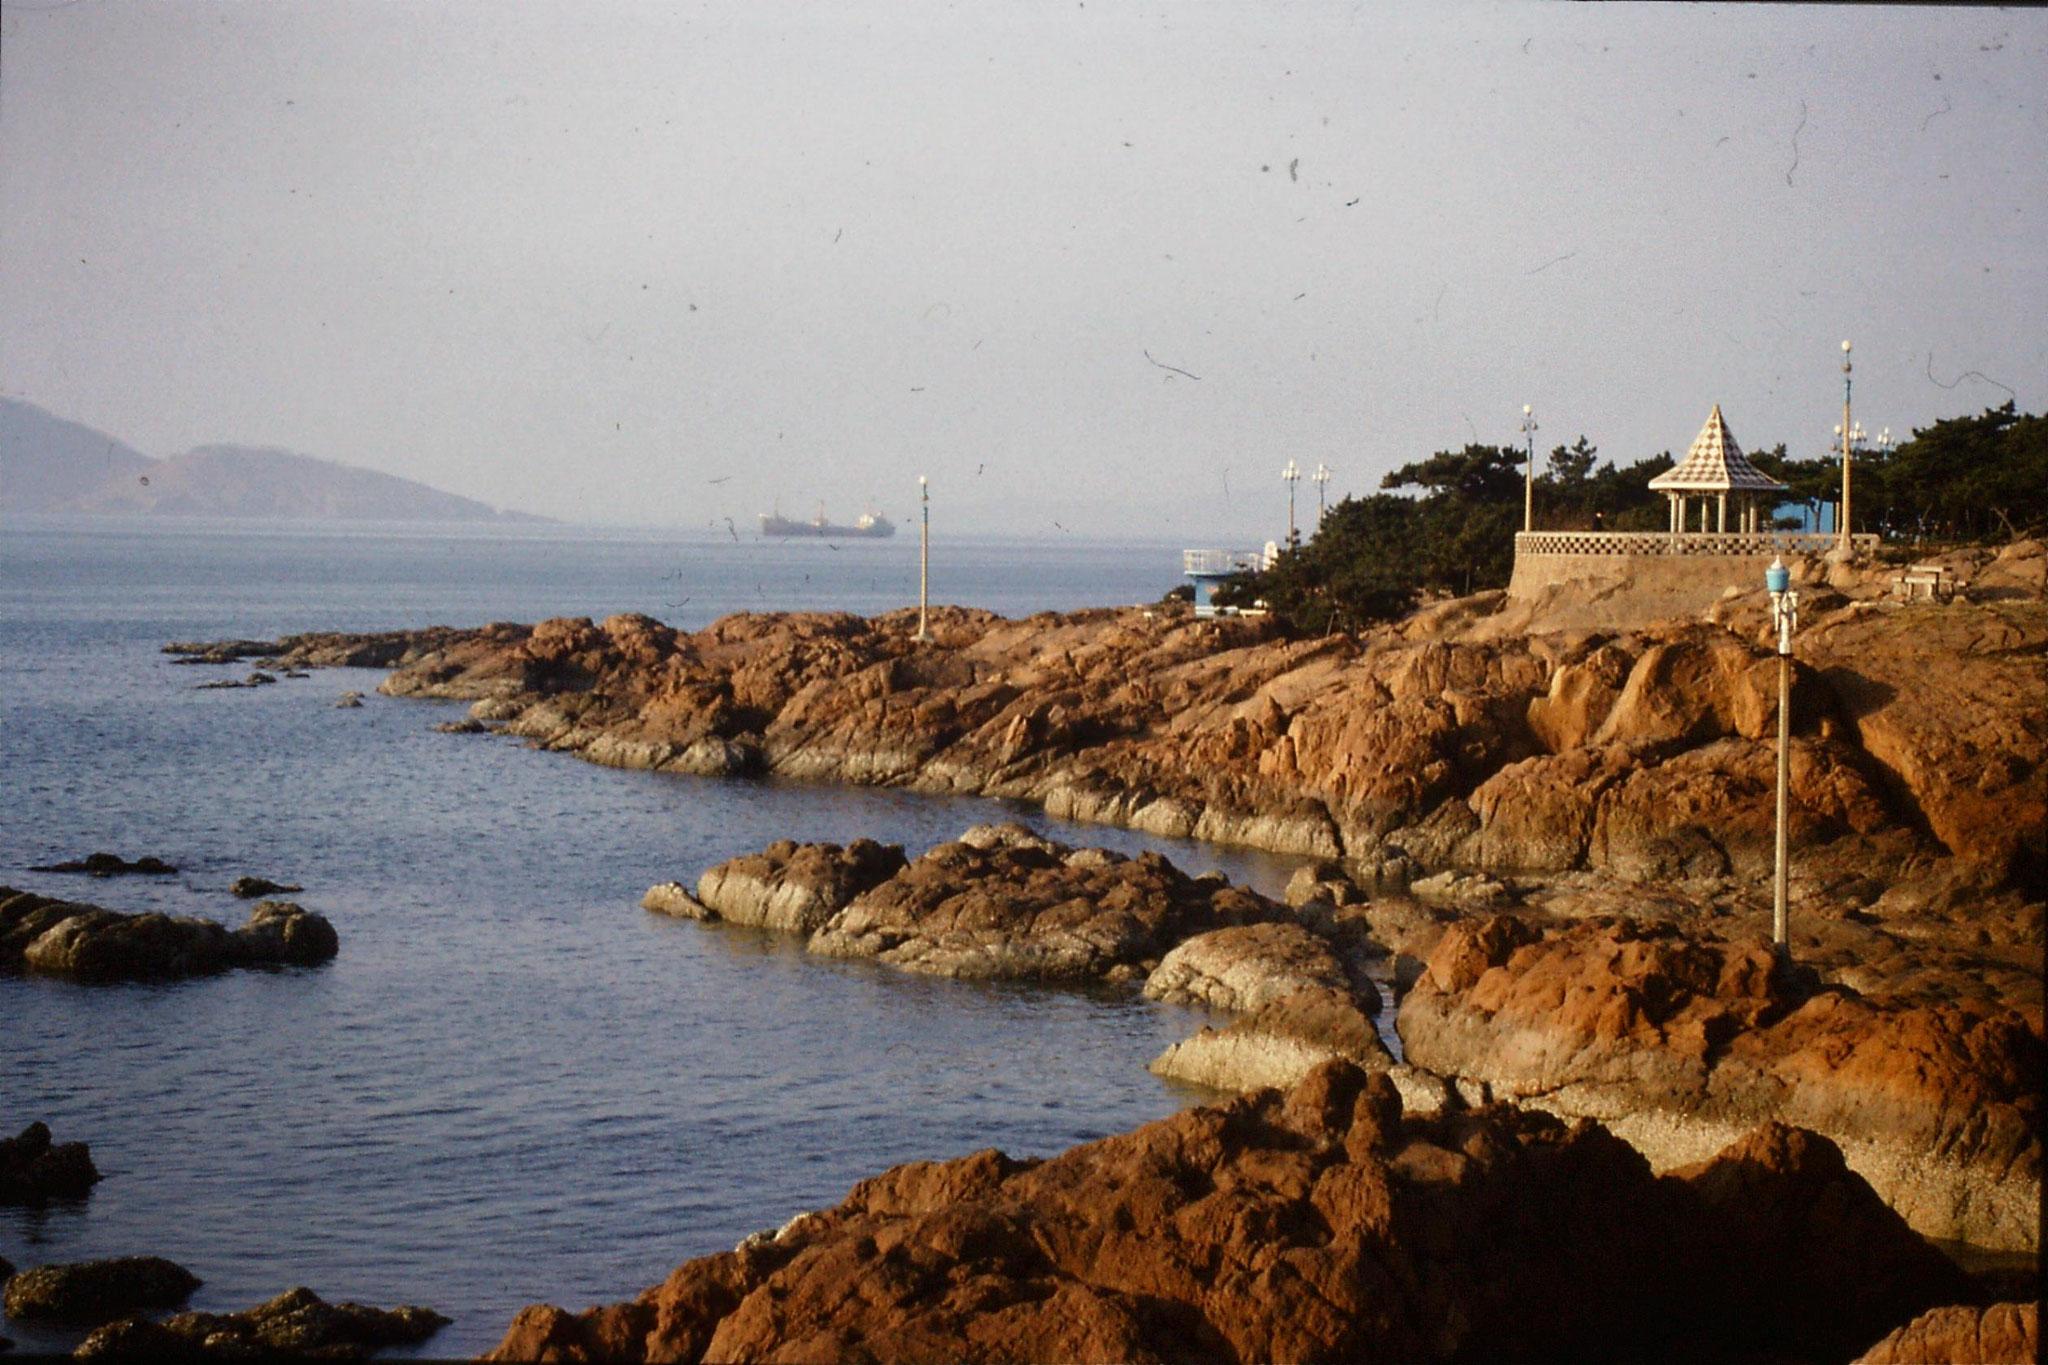 14/2/1989: 1: Qingdao beach